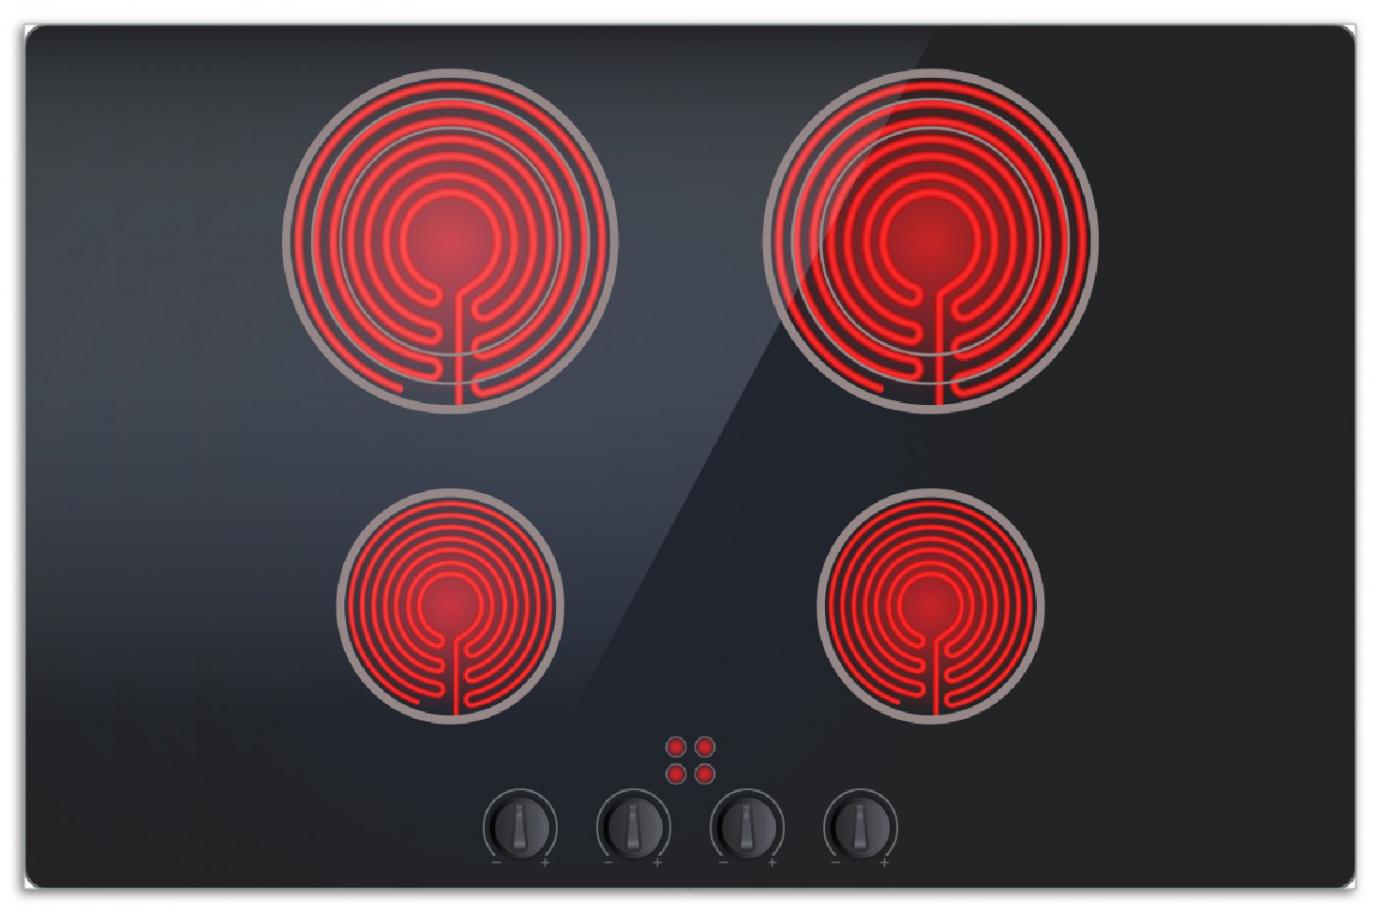 Herdabdeckplatte Aktives Cerankochfeld Induktionskochfeld Optik - Standard schwarz rot  mit 4 Kochplatten und Bedienfeld – Bild 1